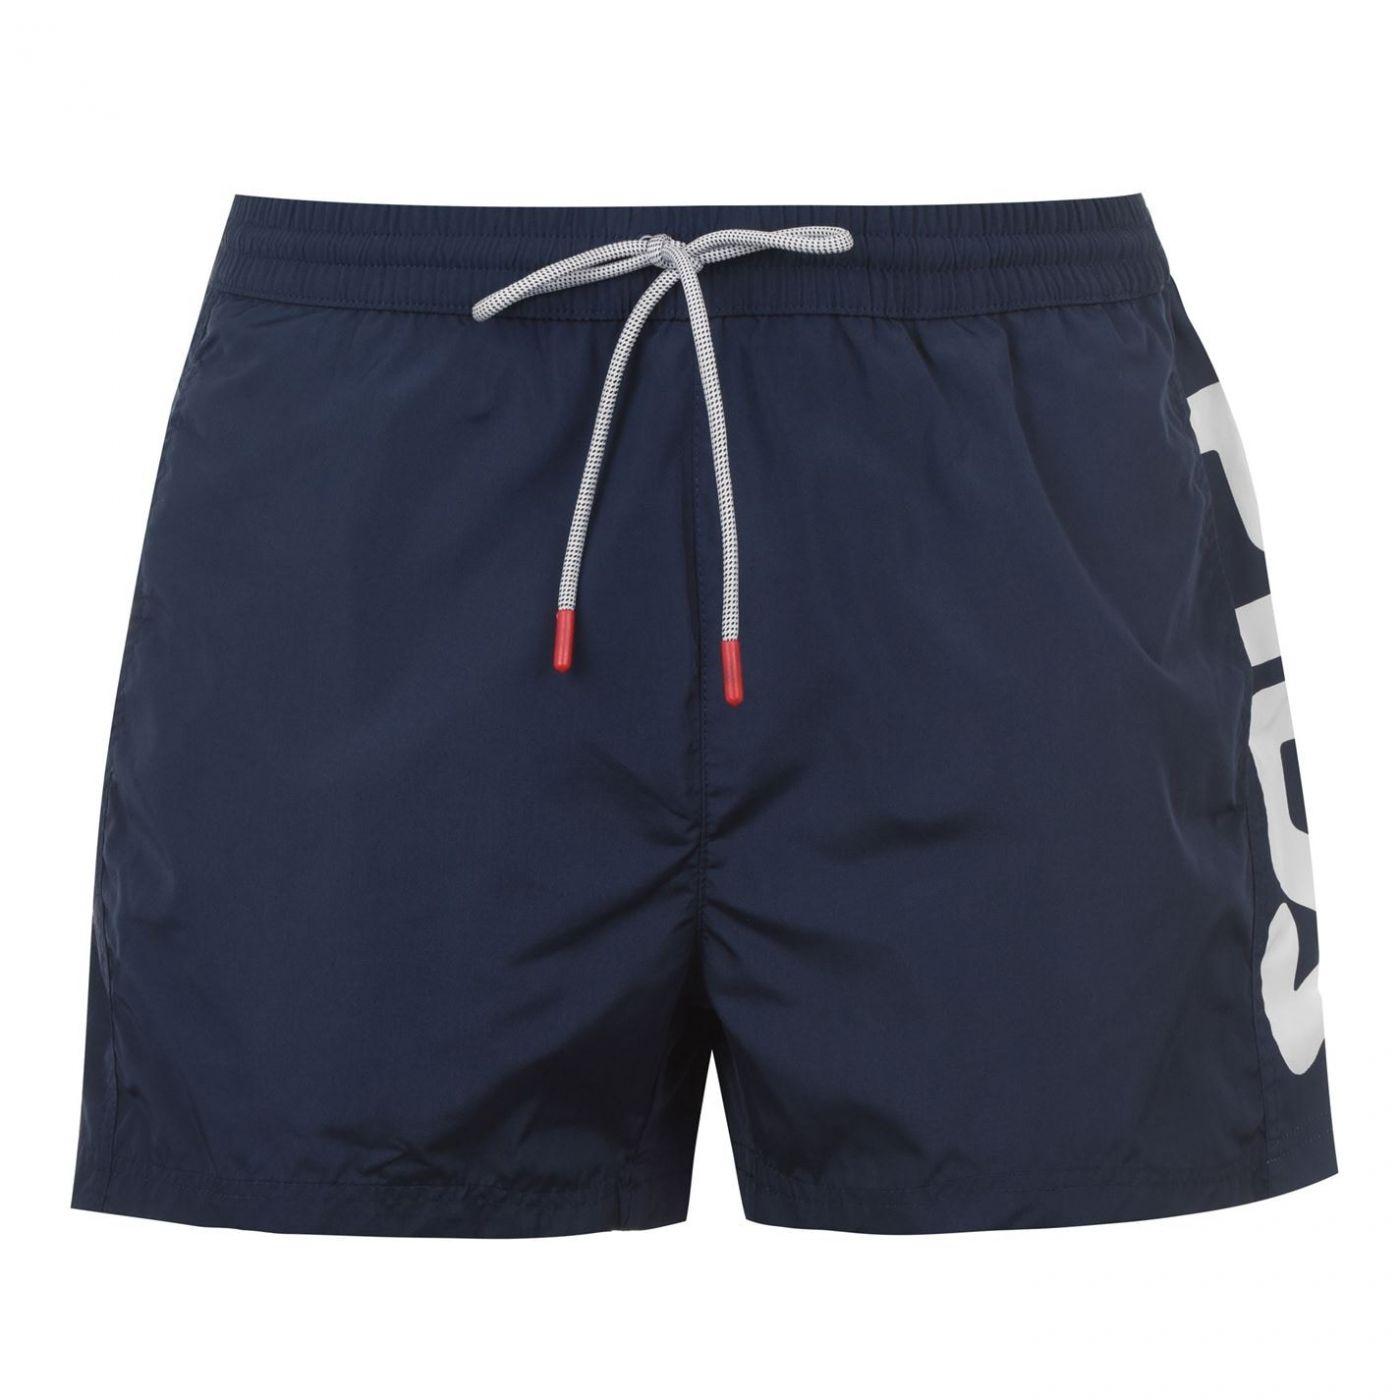 Fila Unlined Swim Shorts Mens